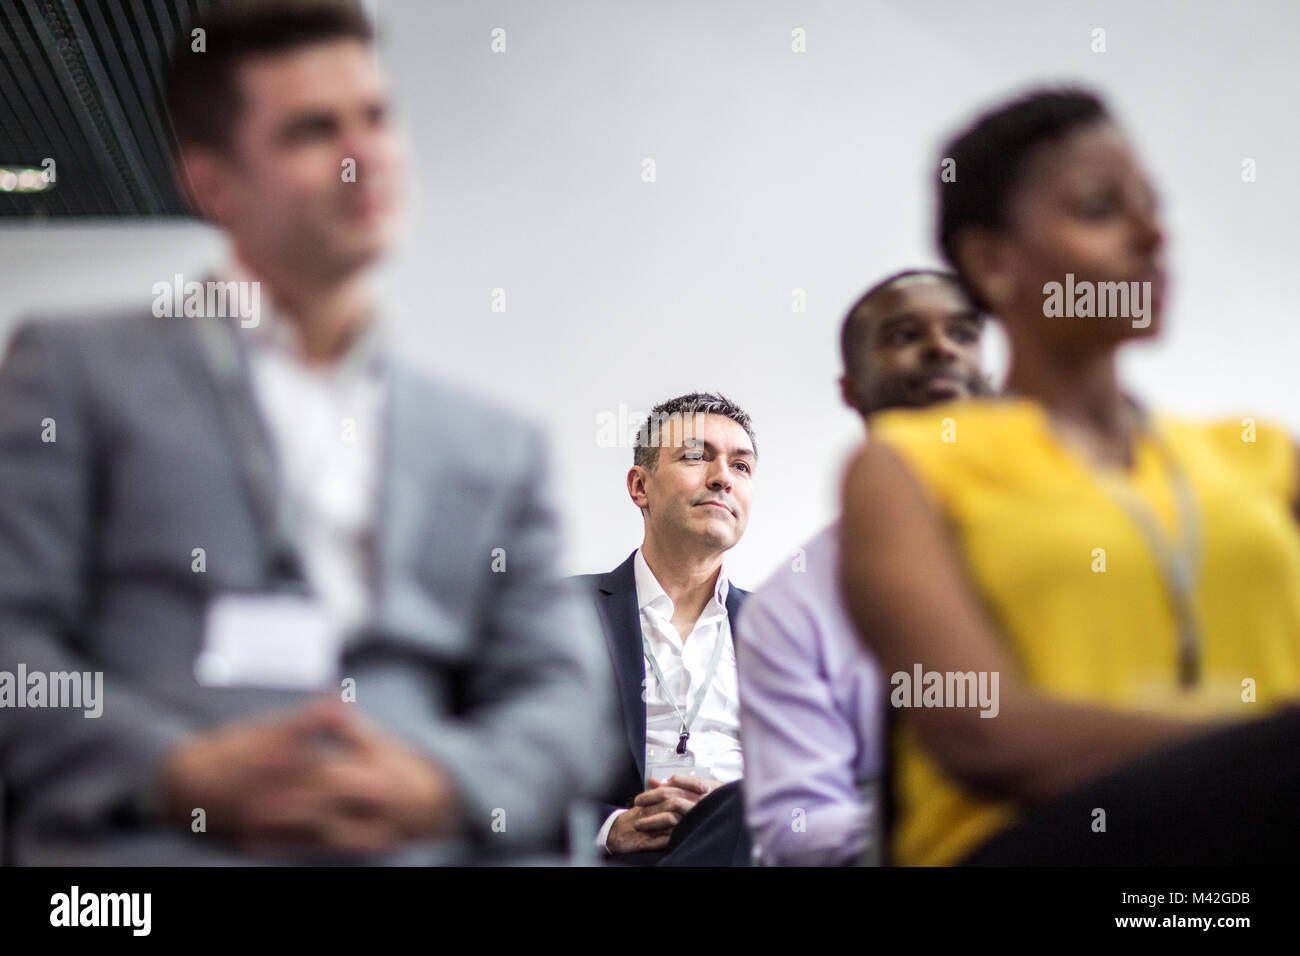 Businessman listening to a motivational speaker - Stock Image